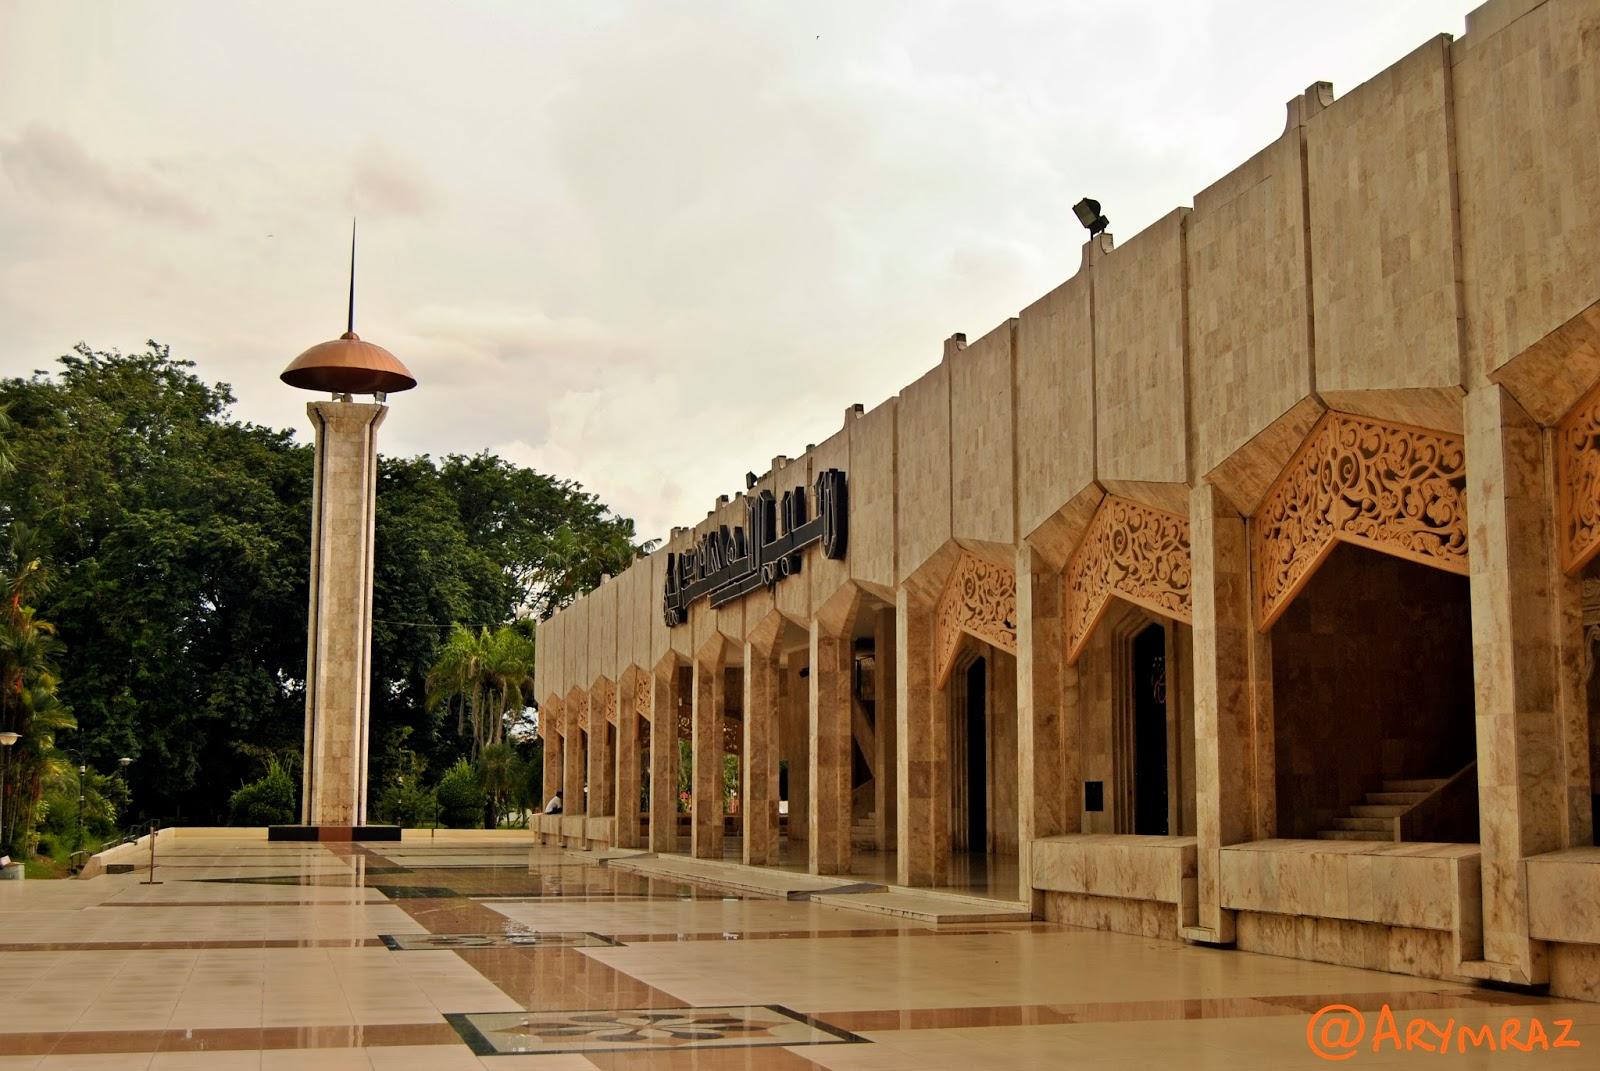 Ary Wardhana Yusuf Jejakku Mesjid Raya Sabilal Muhtadin 02 Masjid